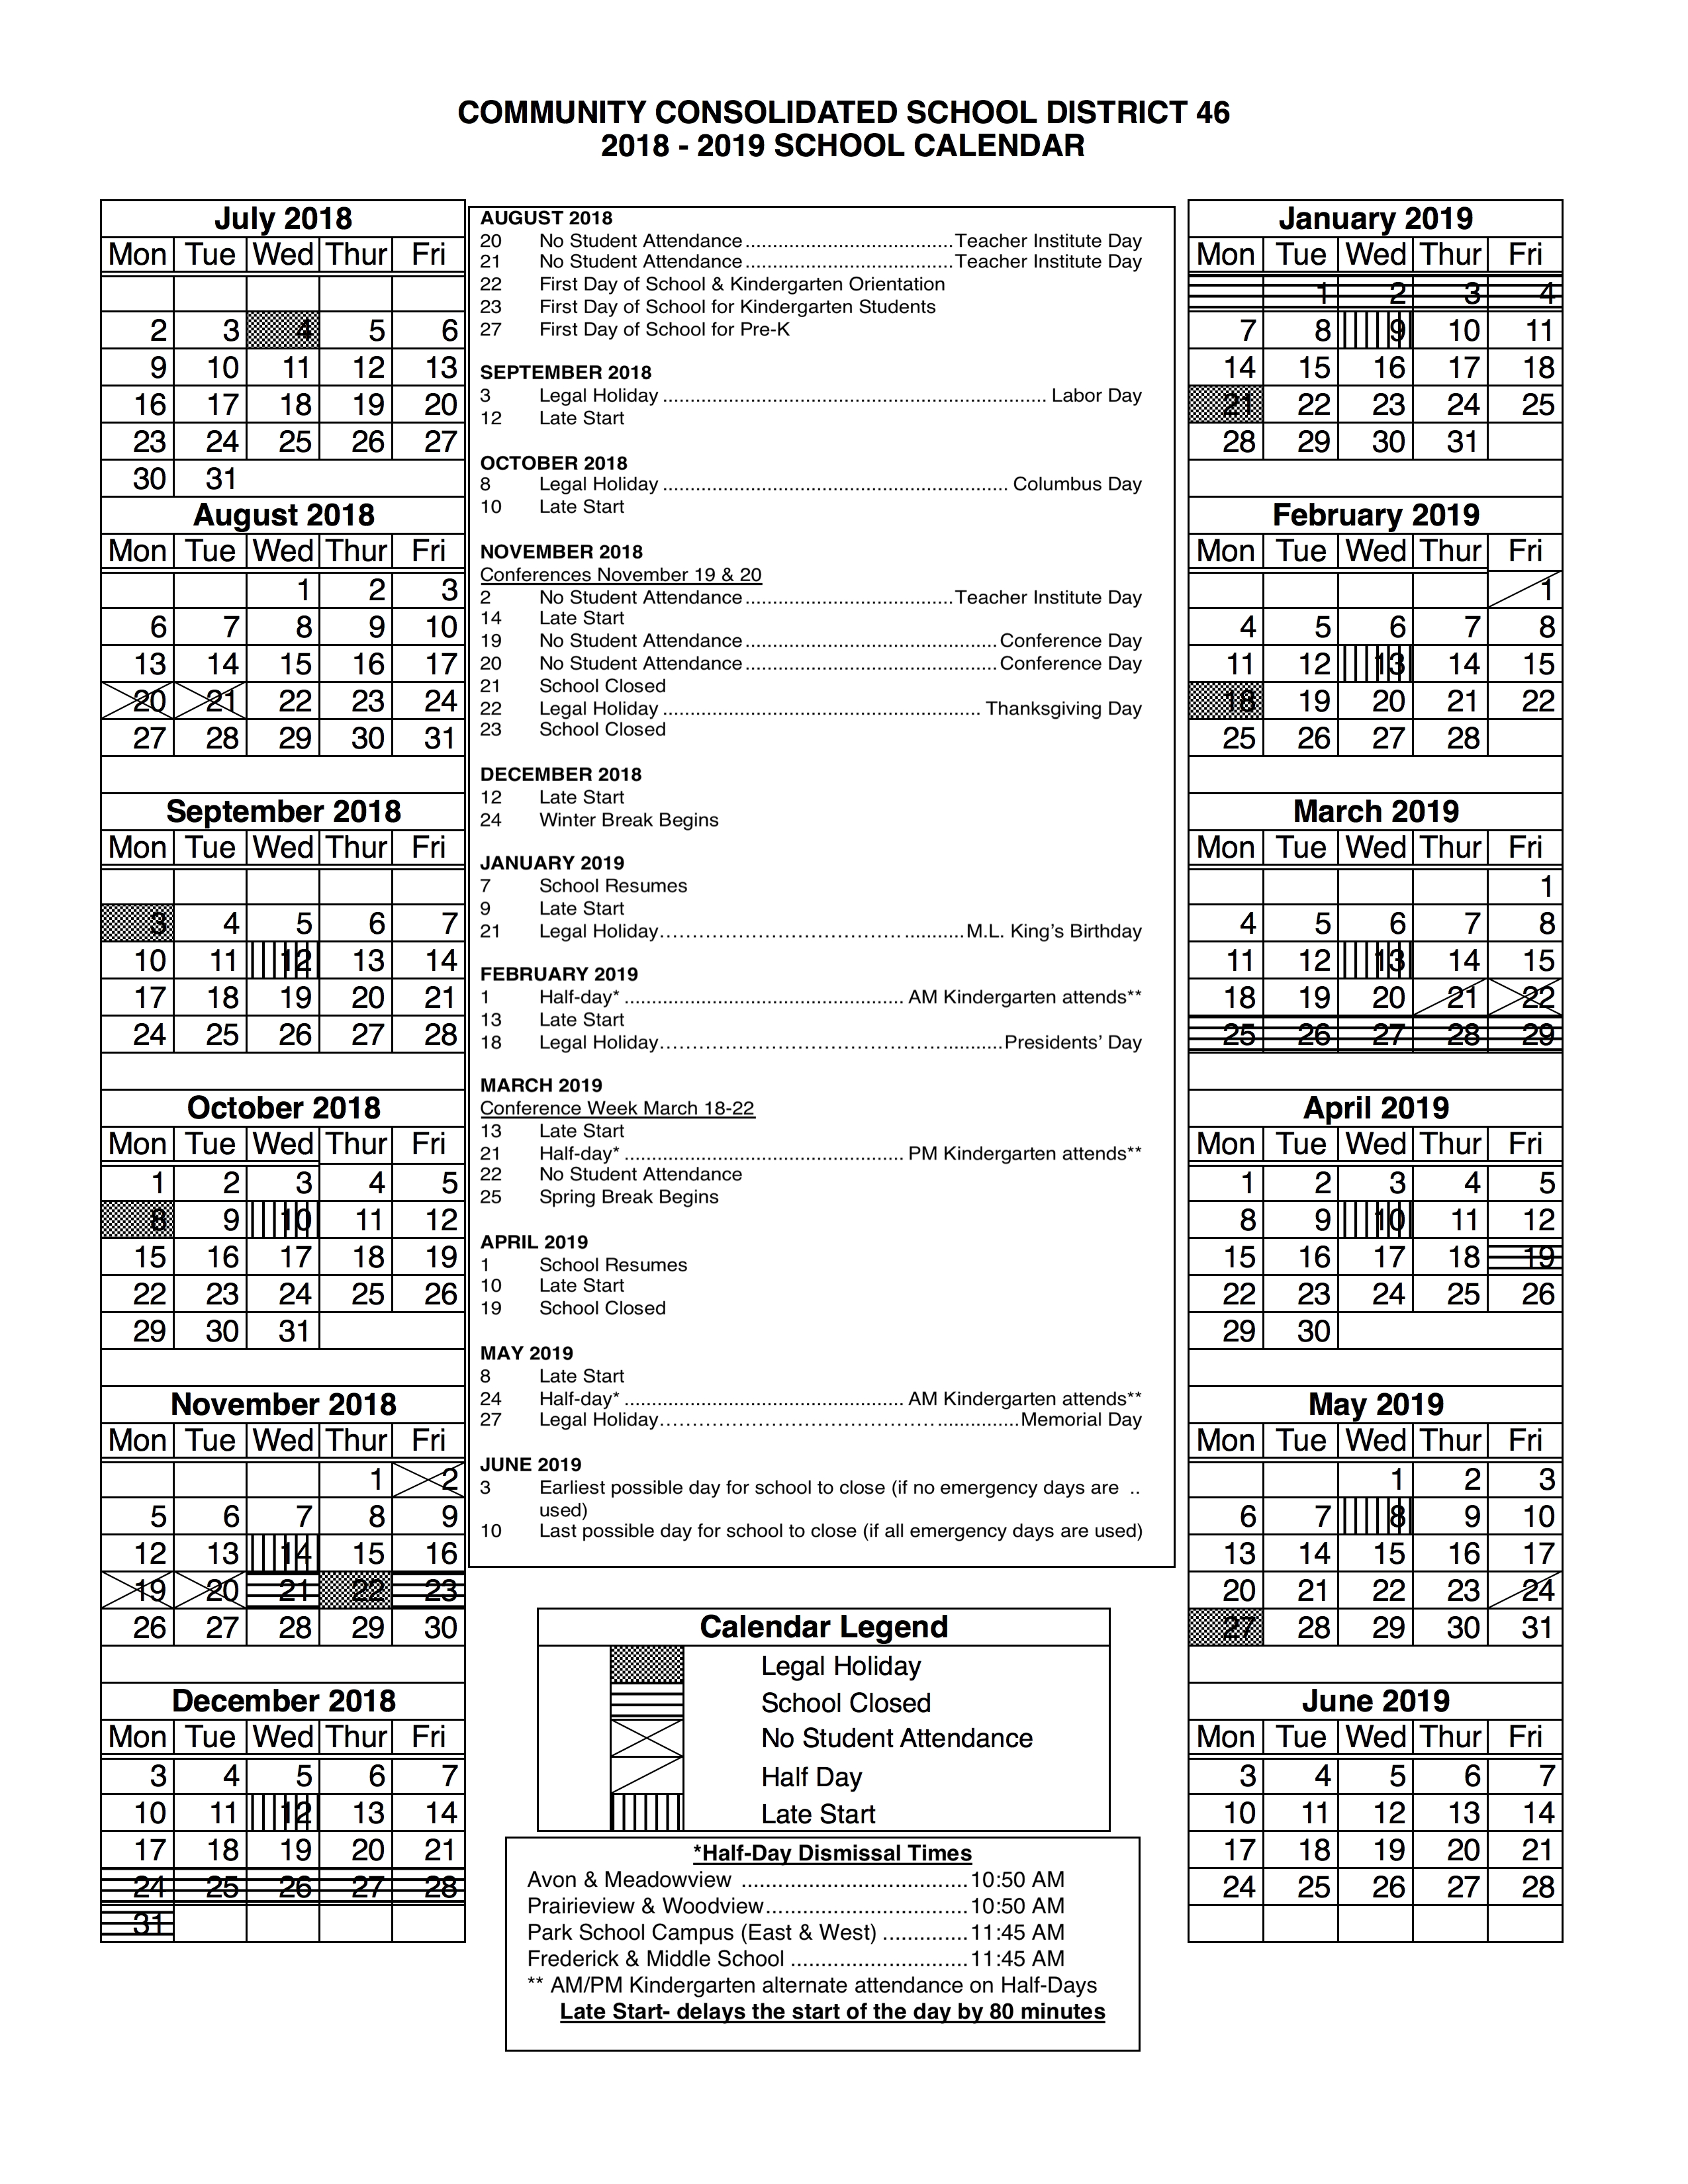 Ccsd 46 - District Calendar U-46 2019 Calendar